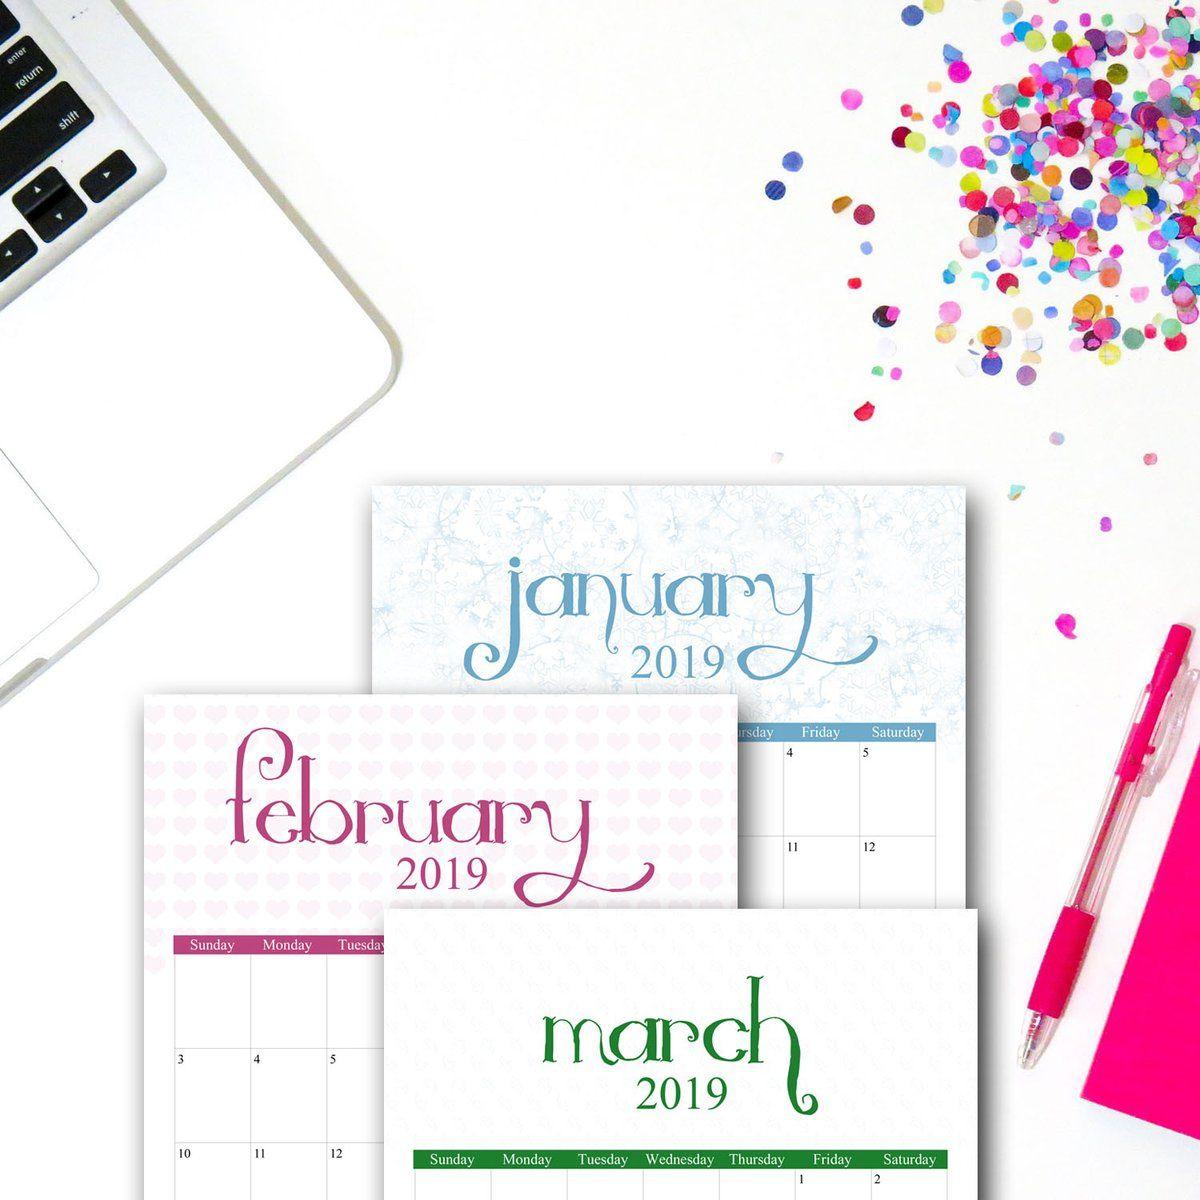 Festive January 2019 Calendar 2019 Printable Calendar | Seasonal Designs | 2019 Calendar